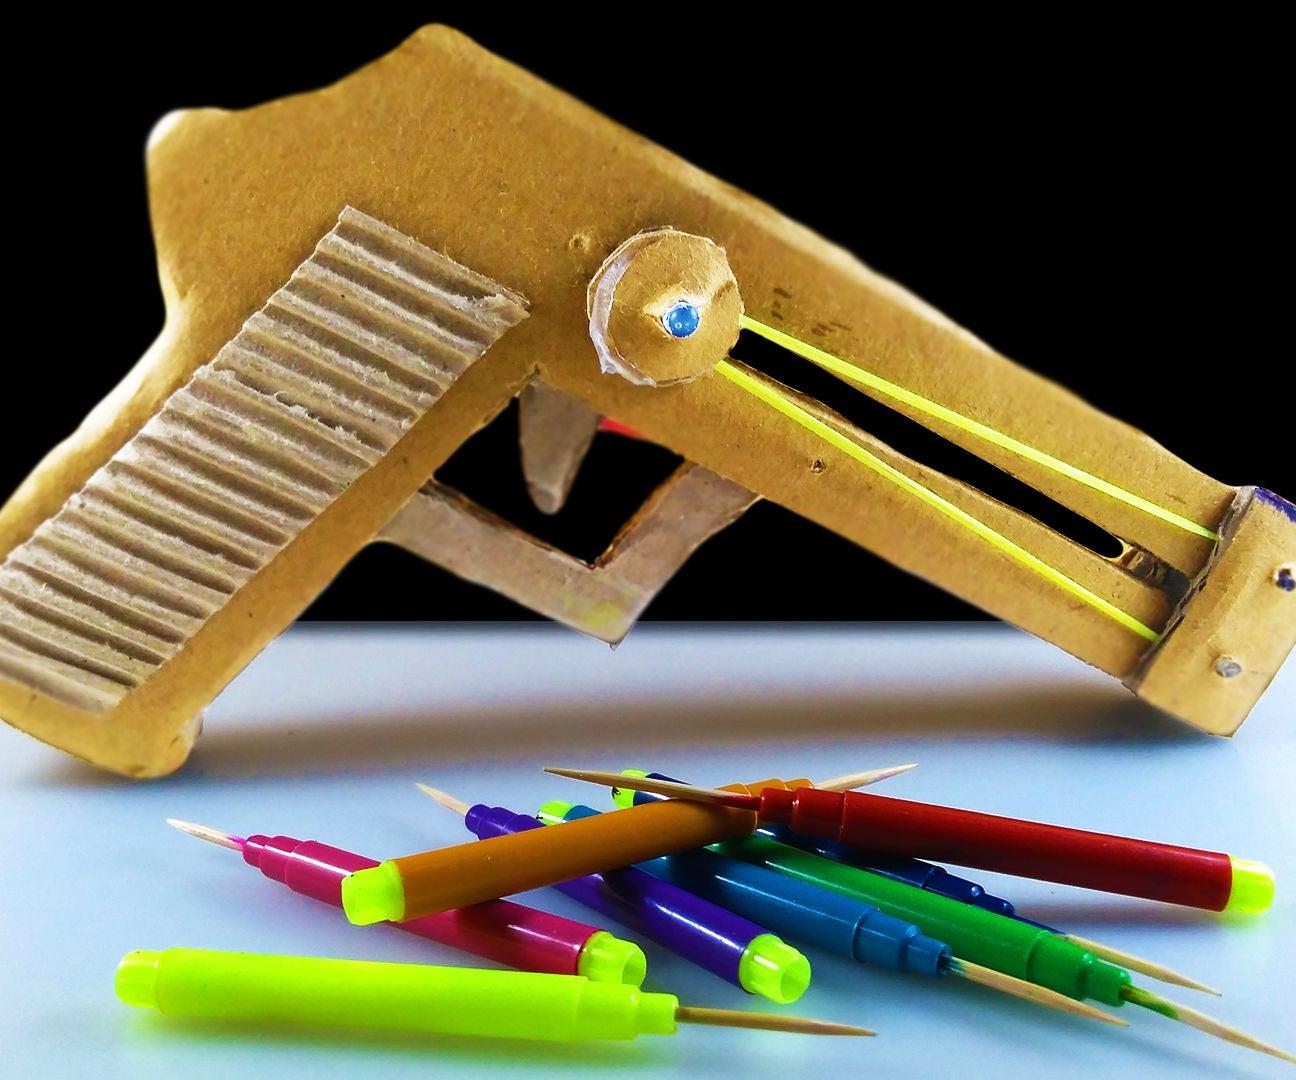 diy pistol toy gun  19 steps  instructables